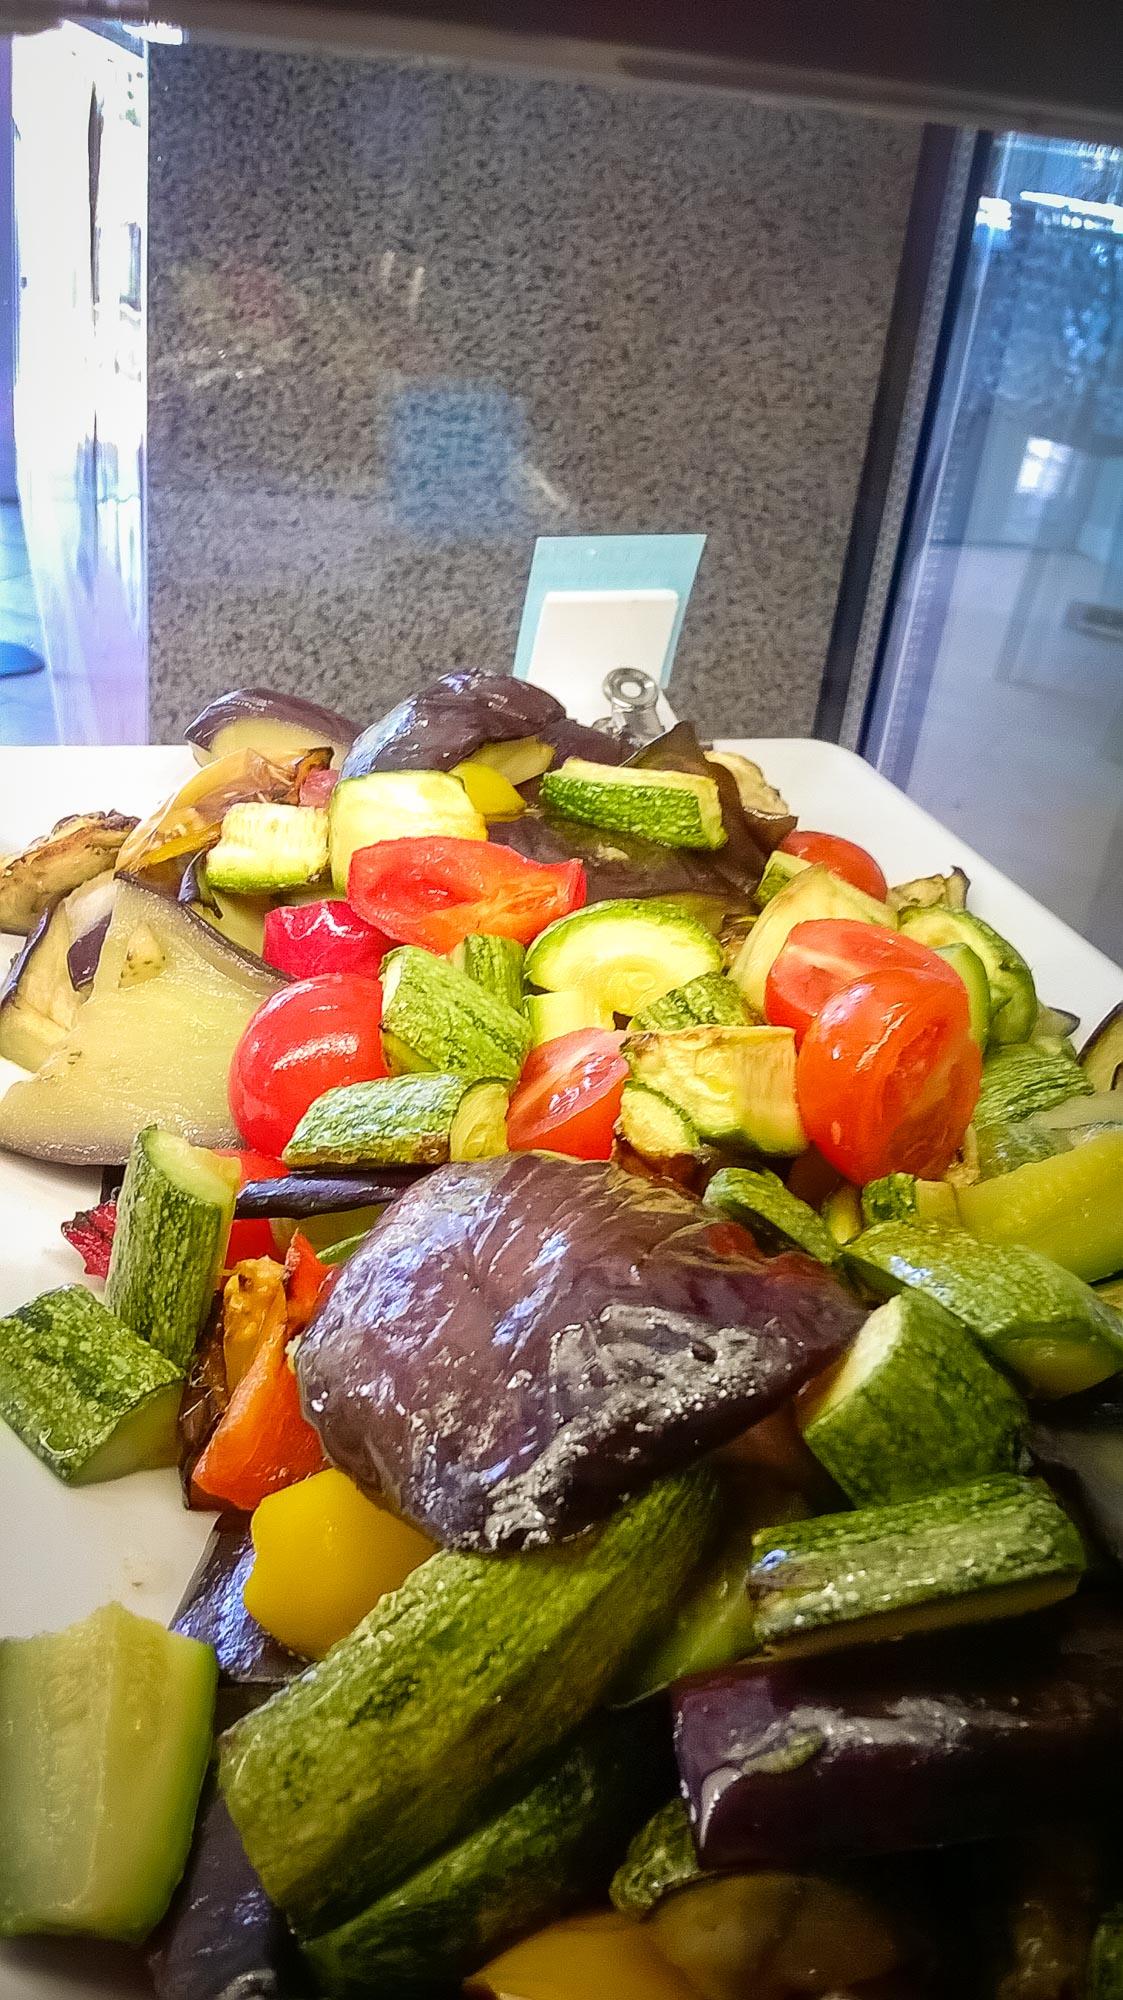 Abbiamo riaperto gnam gnam misano gastronomia tavola - Impasto per tavola calda ...